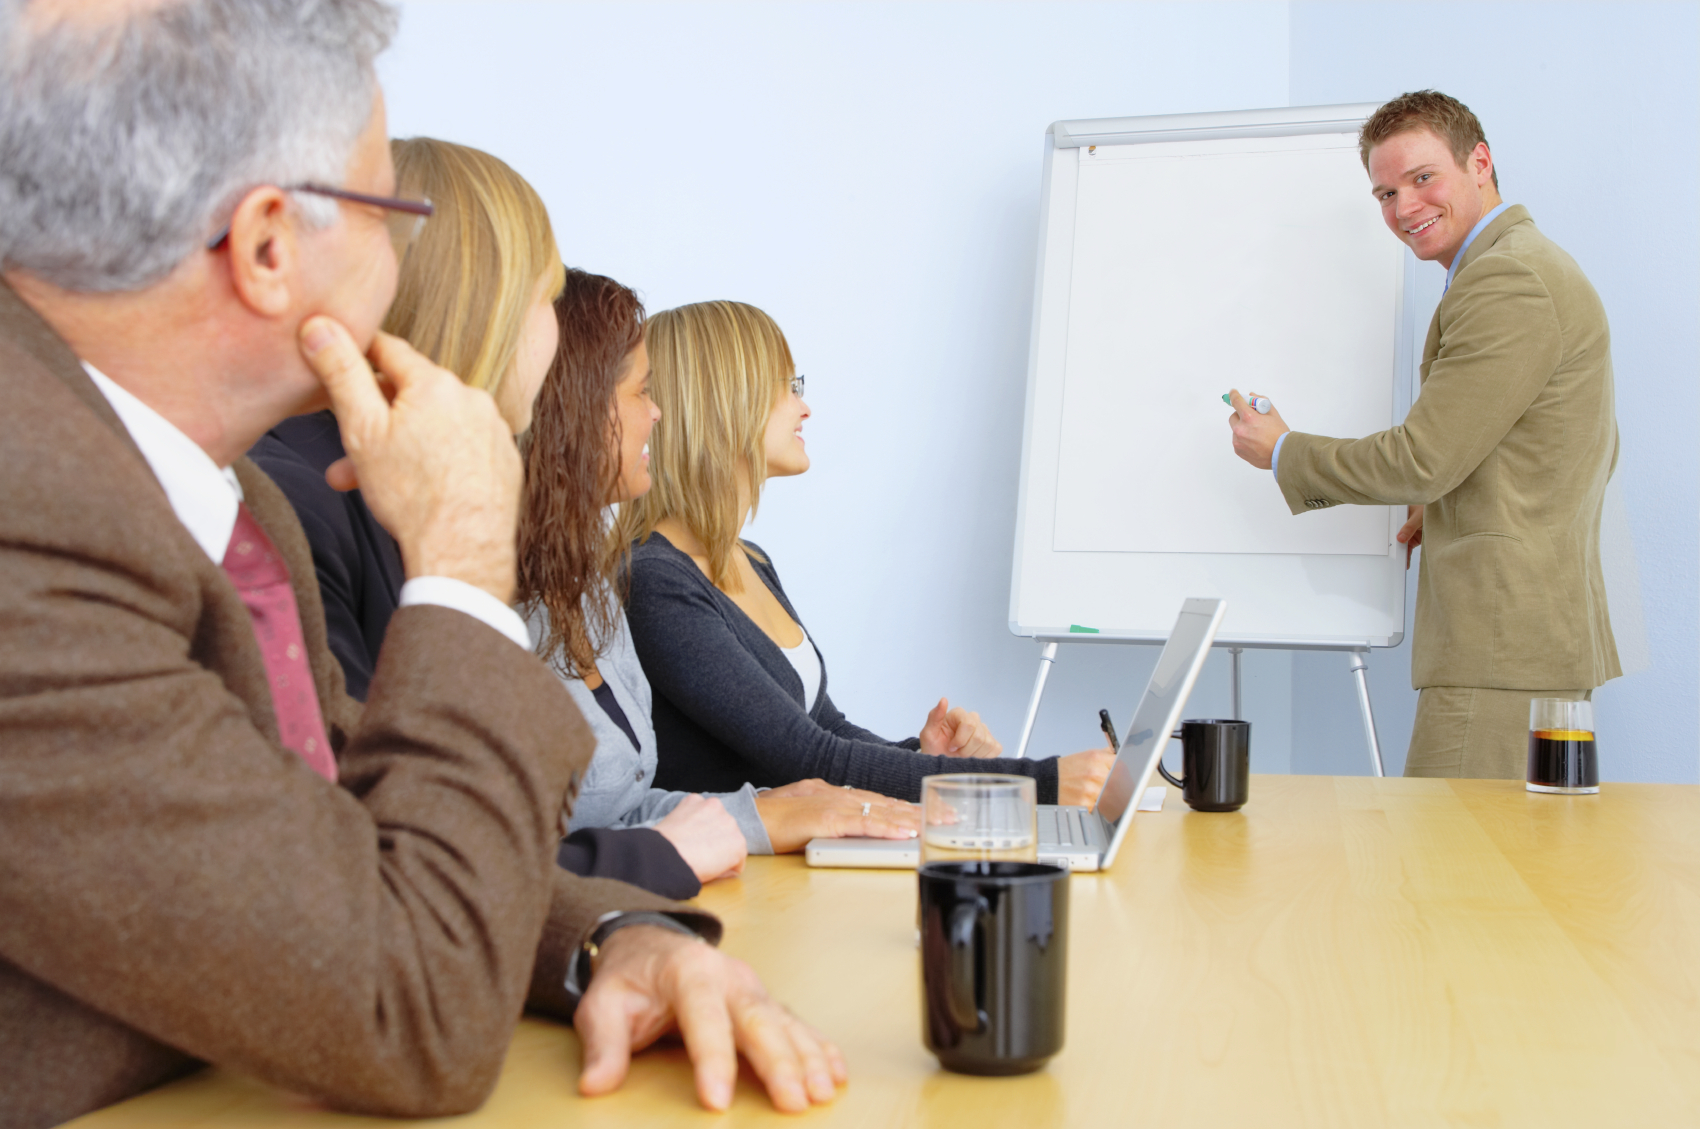 Sales Presentation Success 7 Strategies to Close More Deals – Sales Presentation